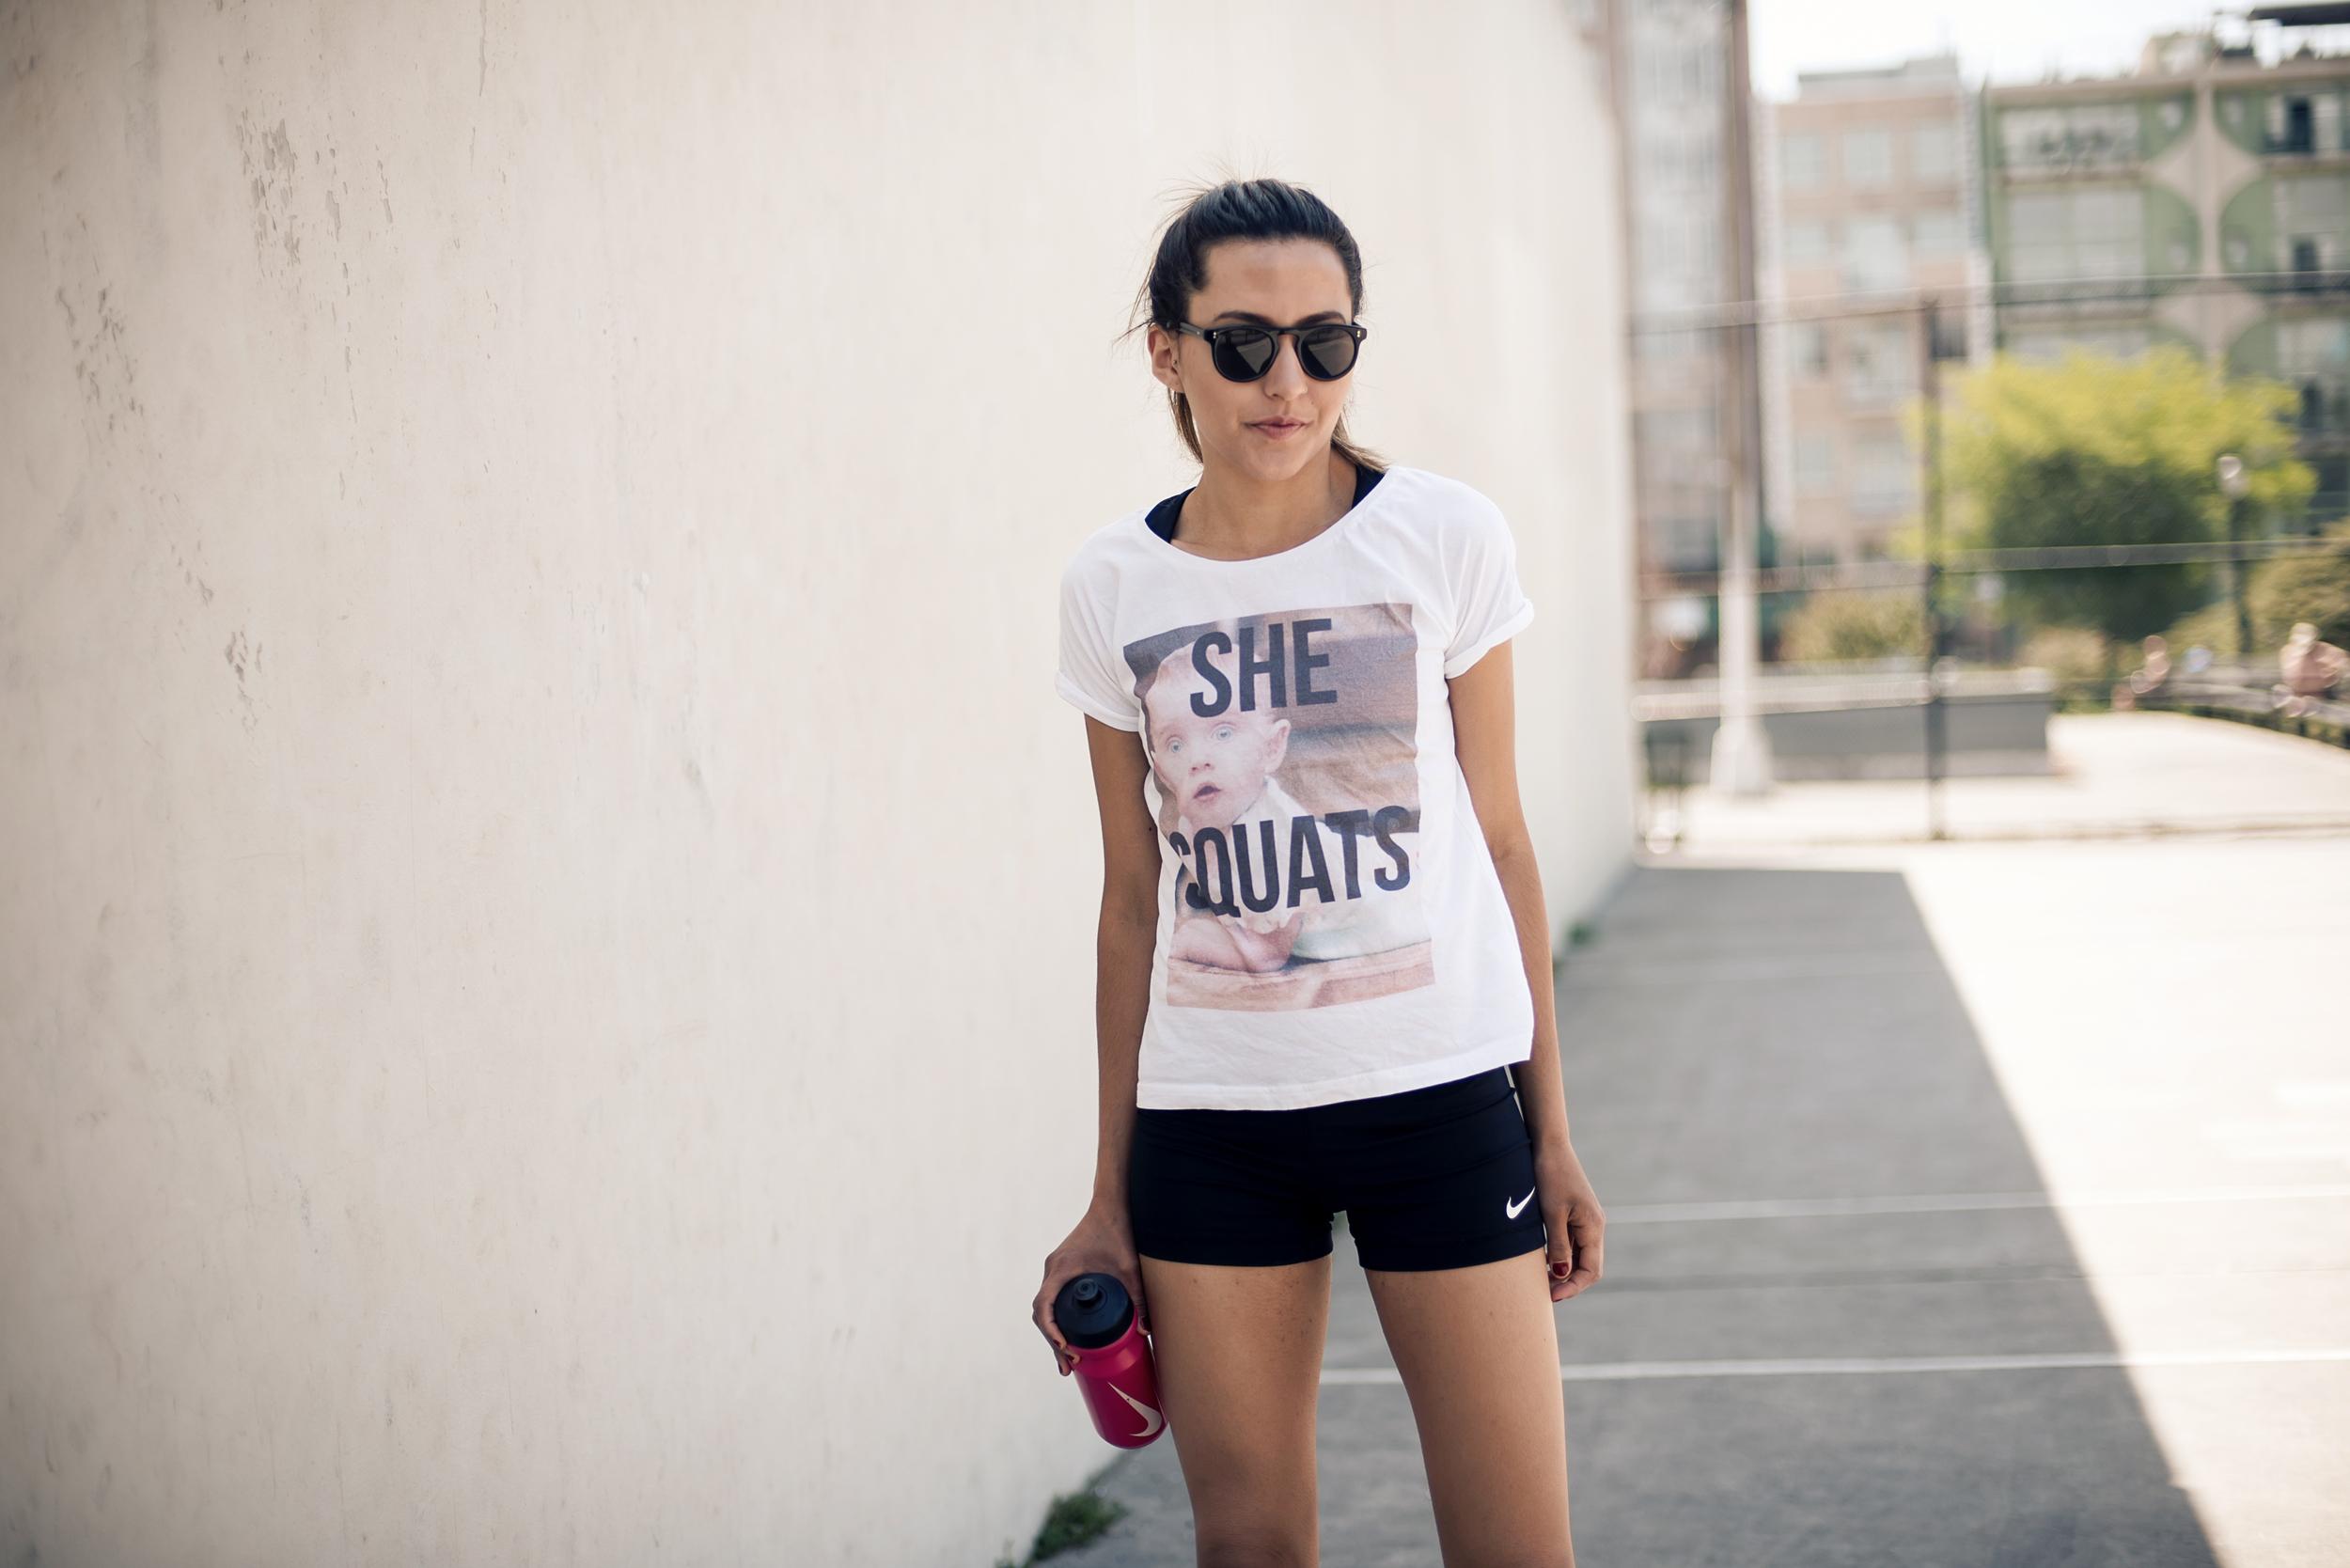 shesquats_shirt_dead_legacy_fashion_blogger_raquel_paiva